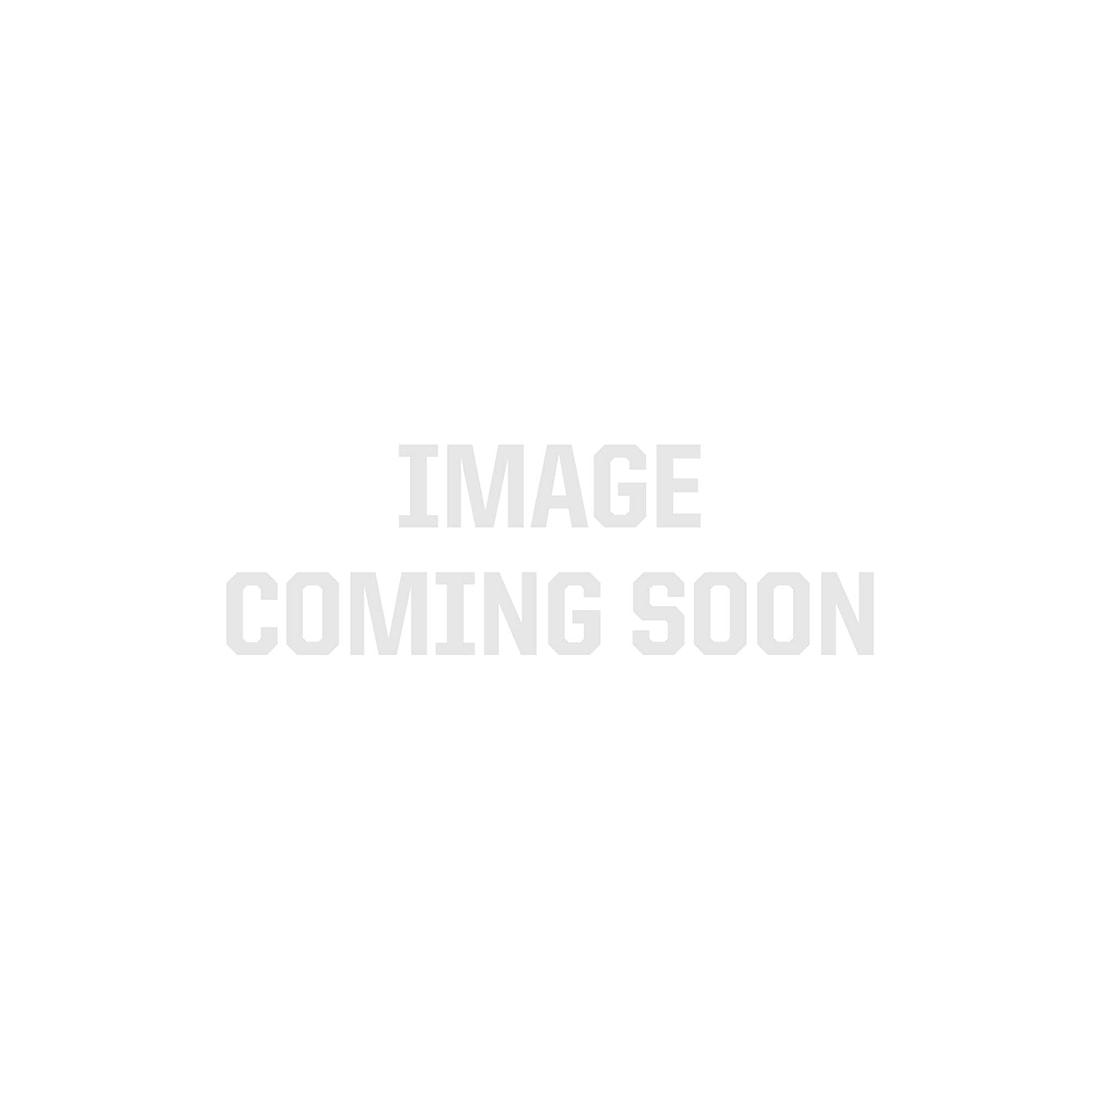 LumenMax 2835 LED Strip Light - 6,500K - 240/m - CurrentControl - 2m Reel